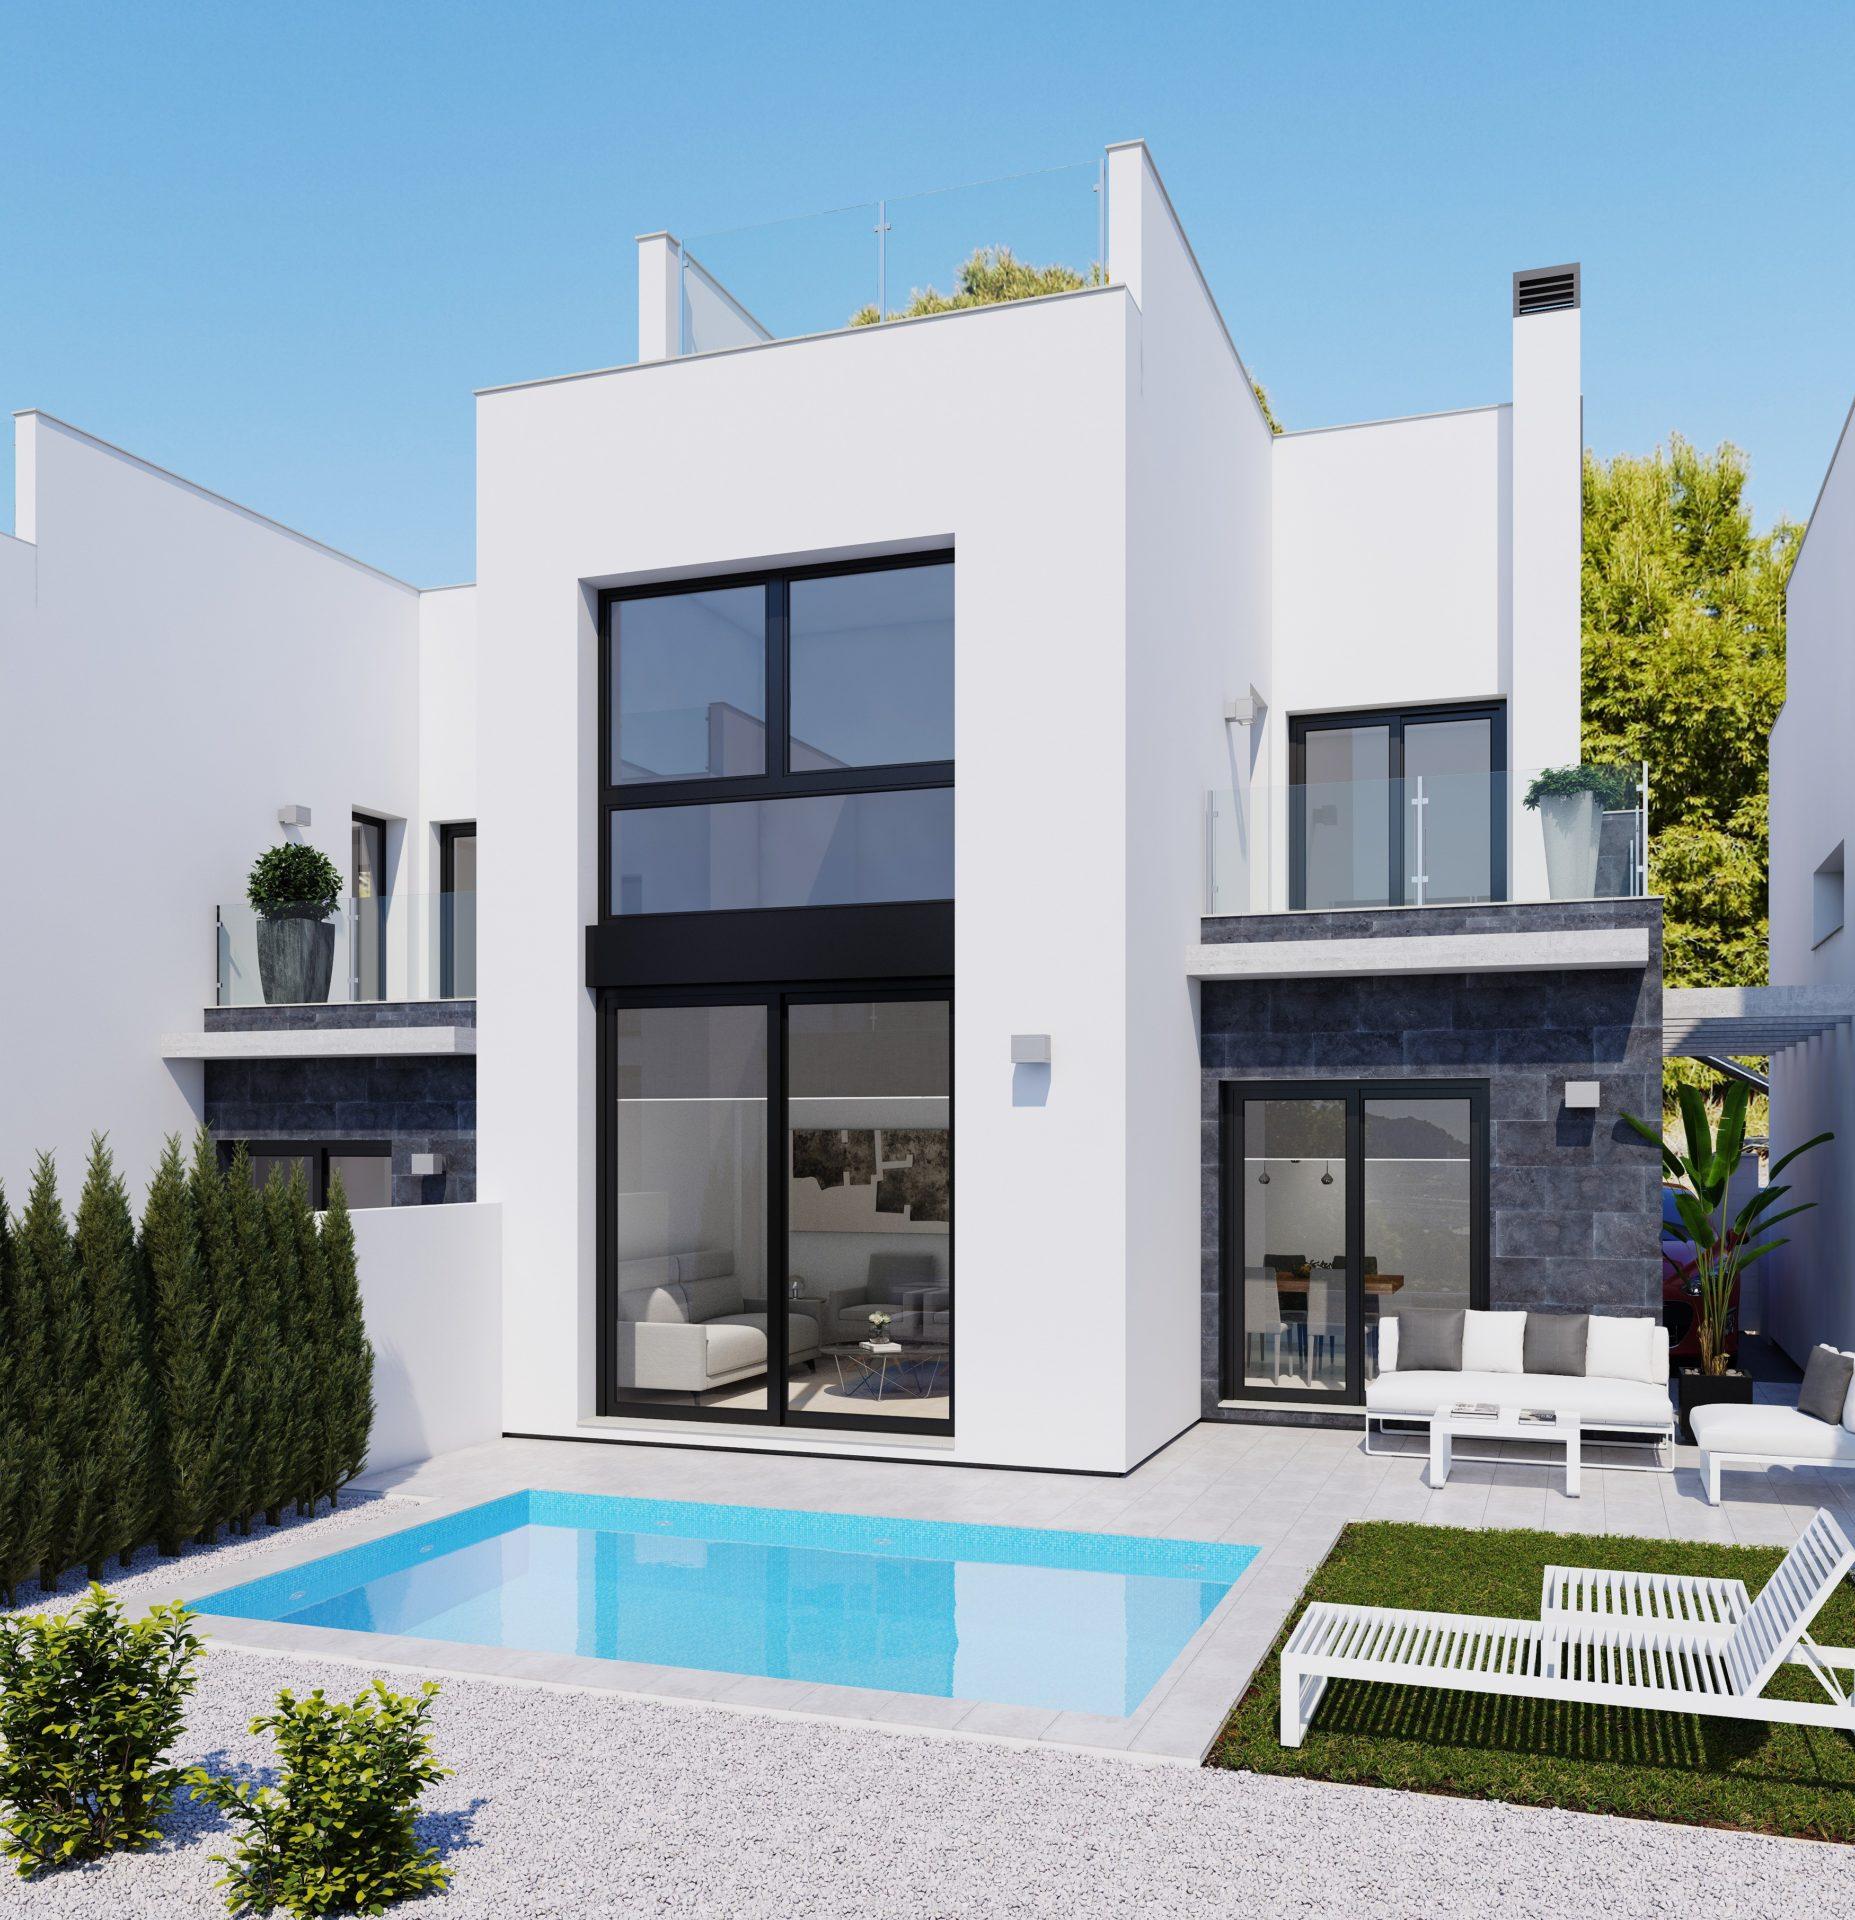 Tindra Homes El Mirador Phase 2 Villas 3